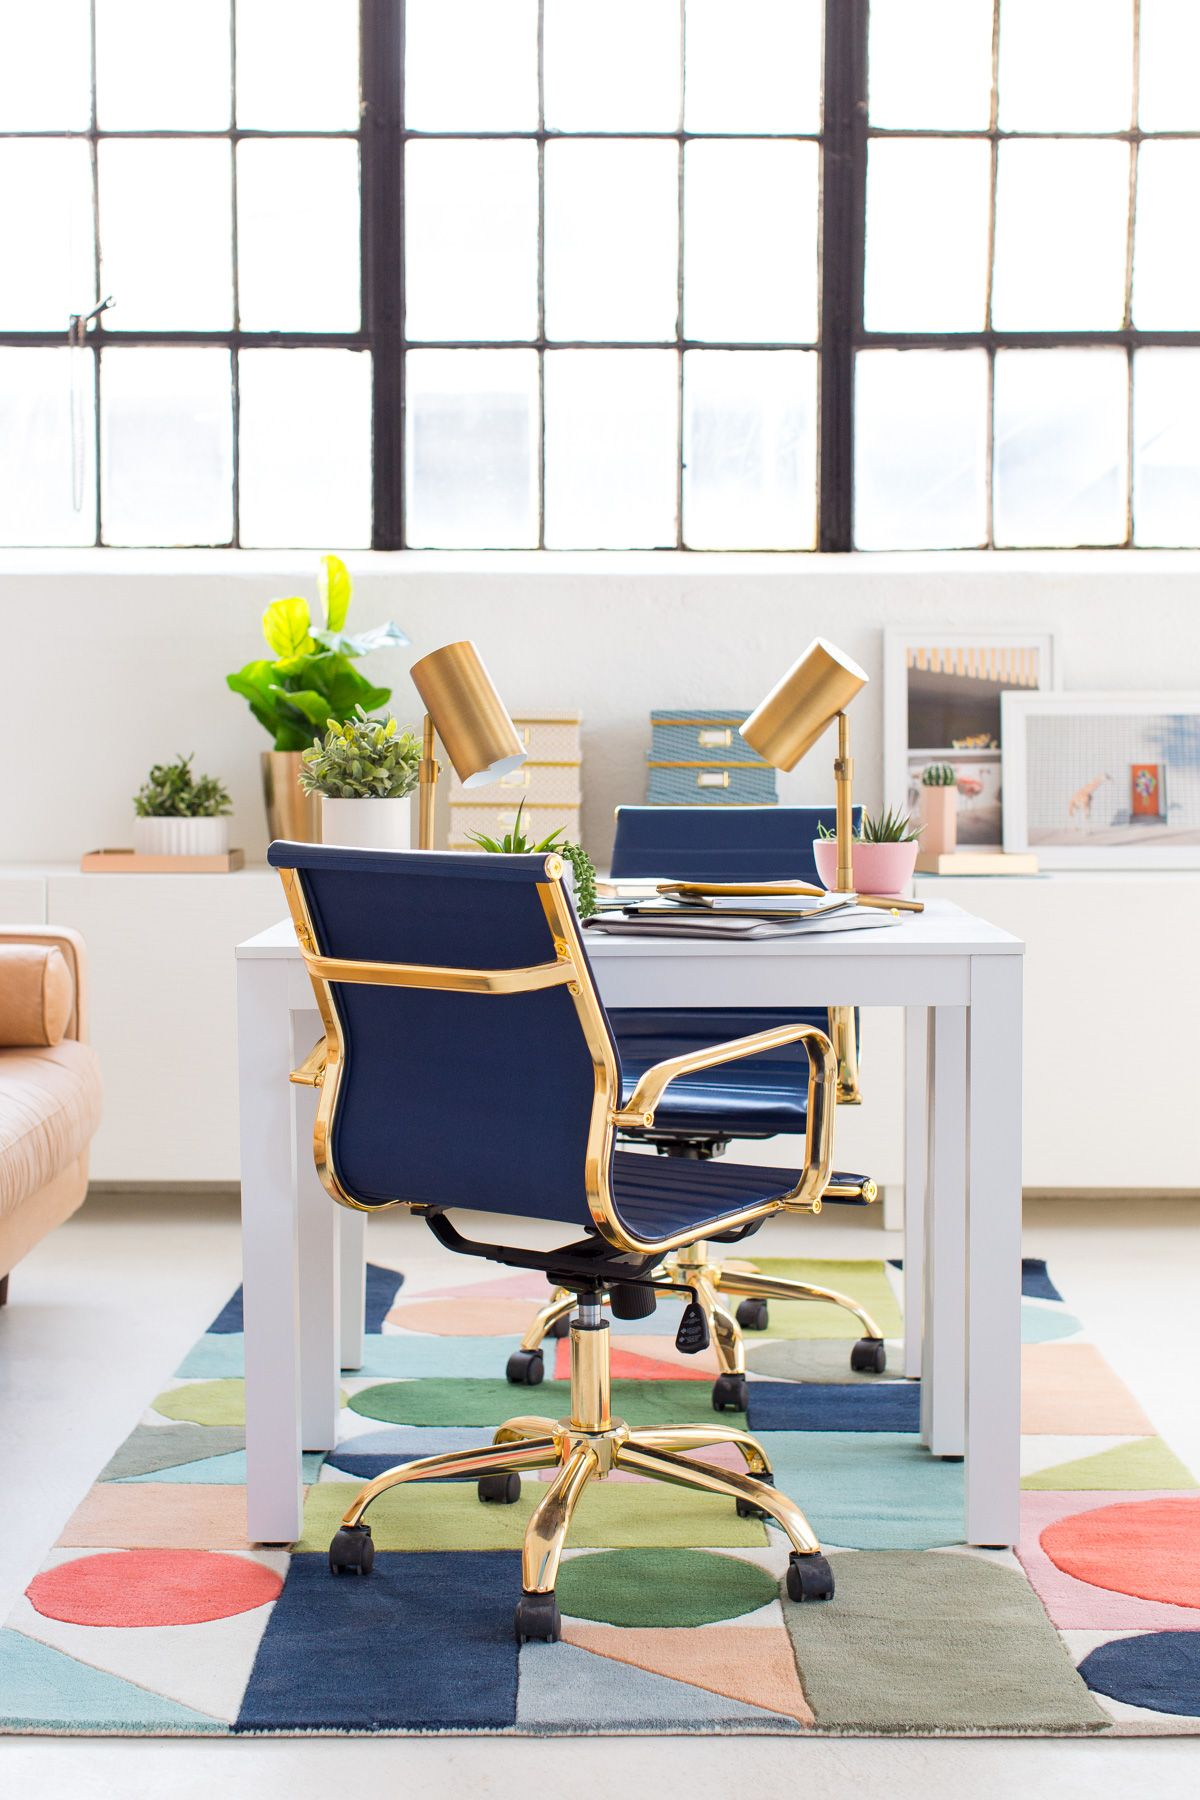 20 best home office decorating ideas home office design photos rh housebeautiful com